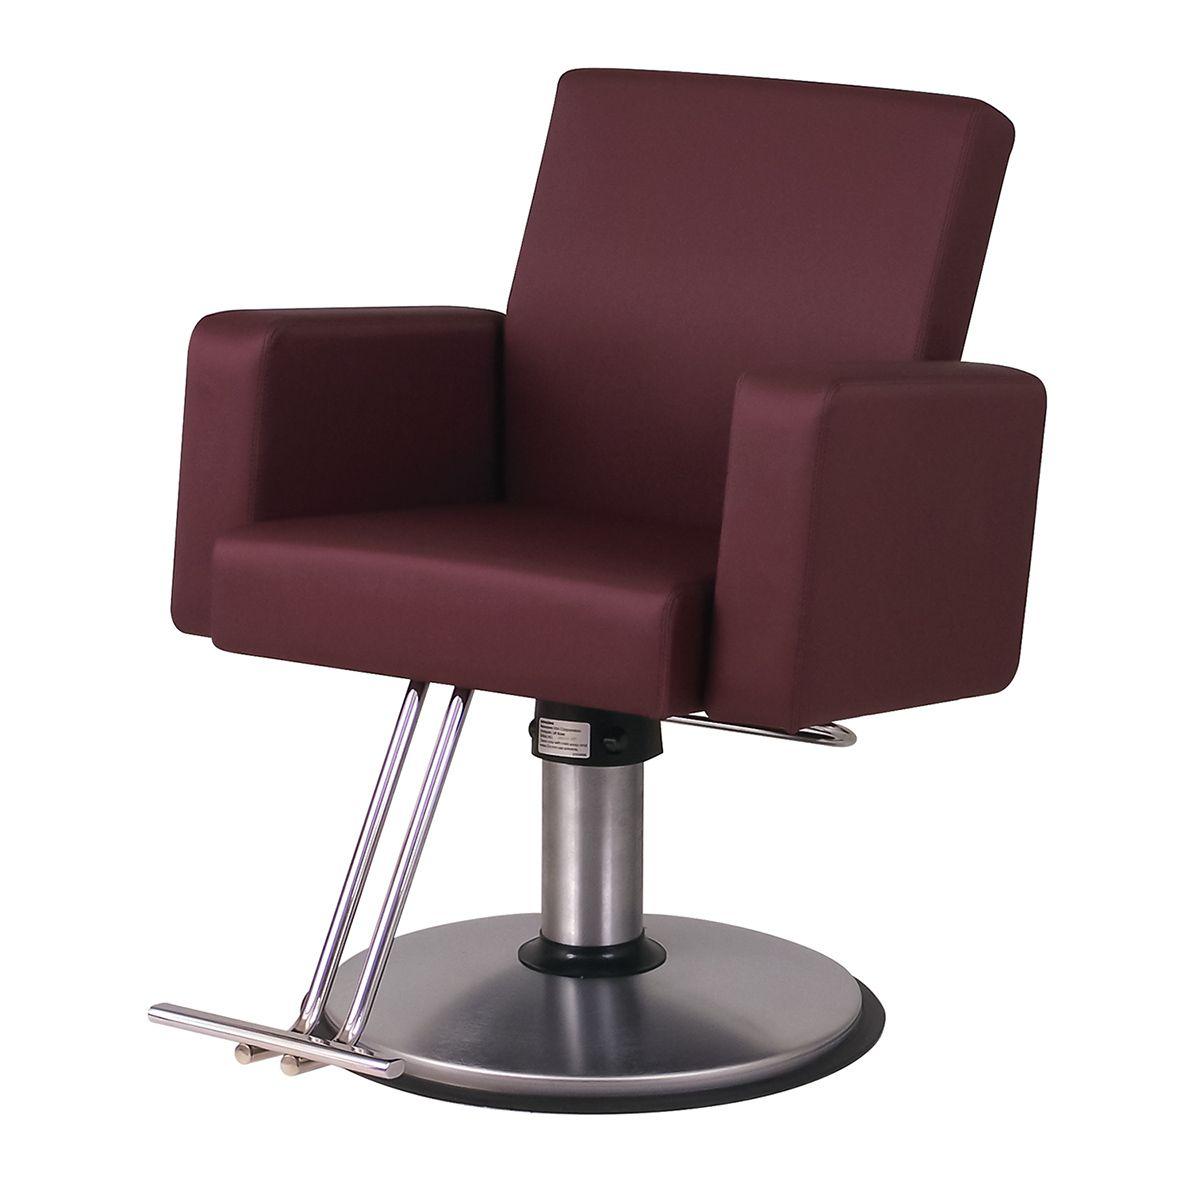 Belvedere Plush Ph11 All Purpose Reclining Salon Barber Chair